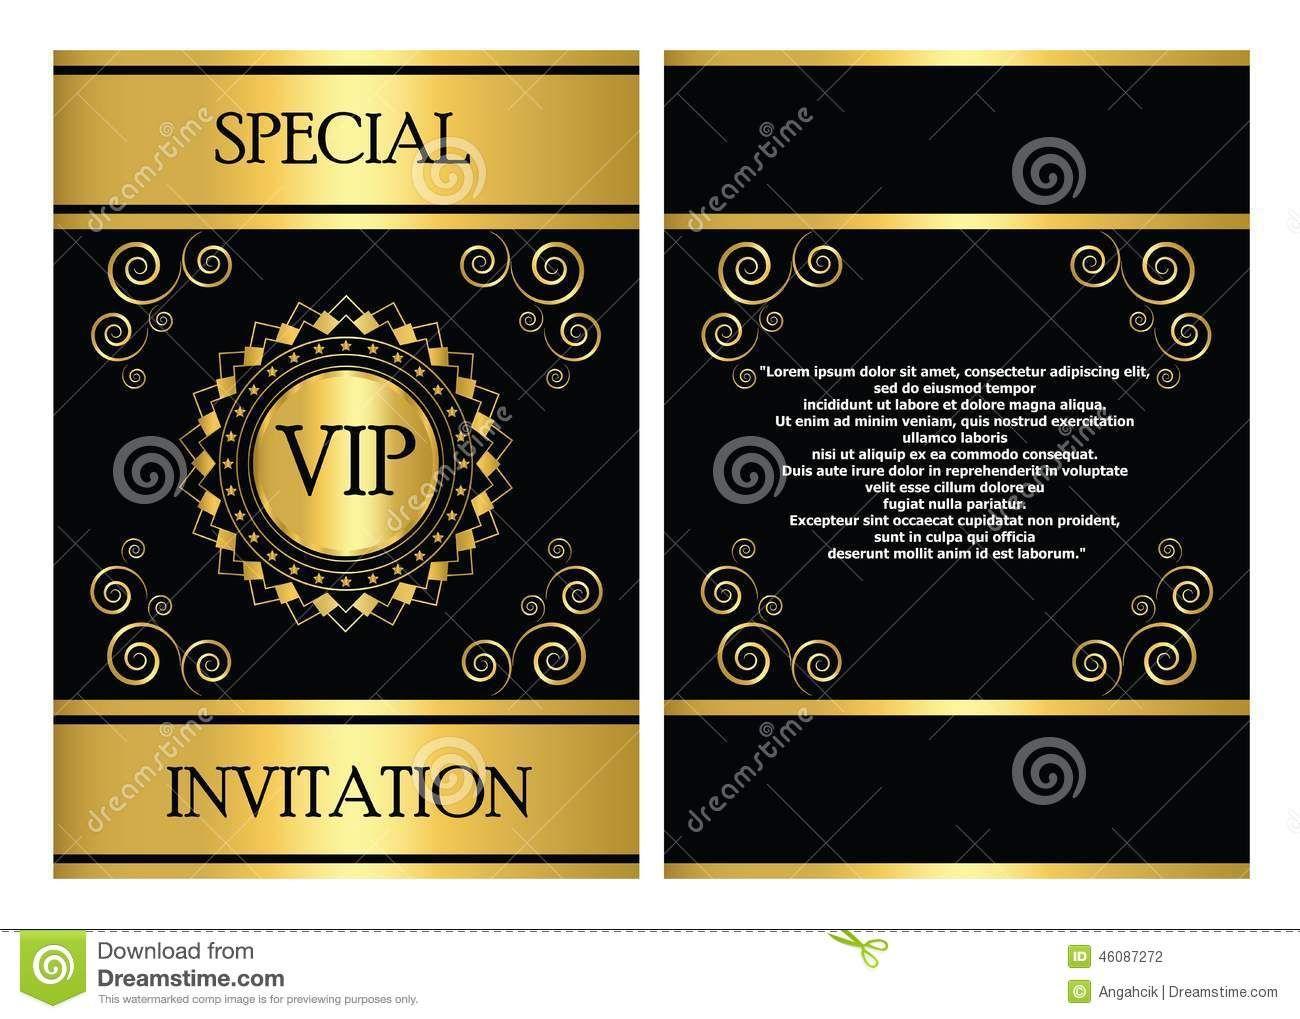 Vip Invitation Card Template Stock Vector Illustration Of Pertaining To Event Invita Invitation Card Sample Business Events Invitation Invitation Card Design